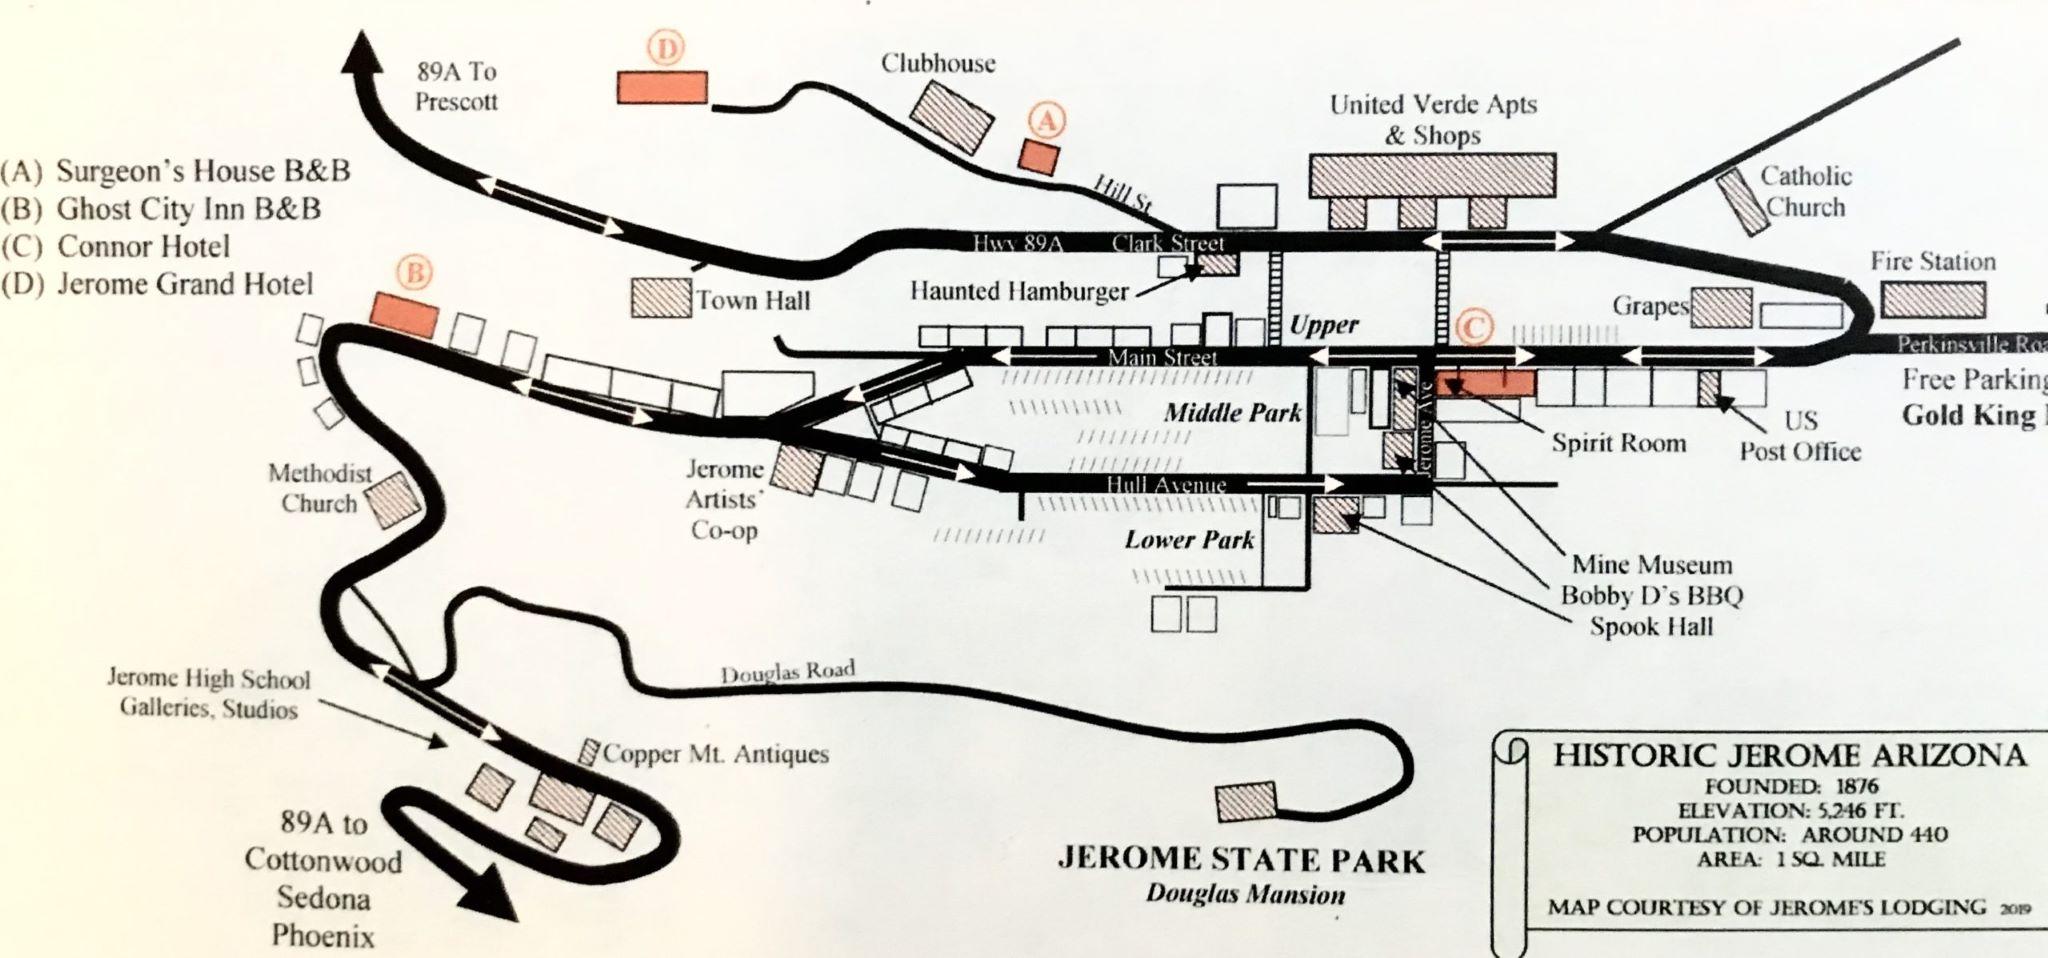 Historic Jerome Lodging Map